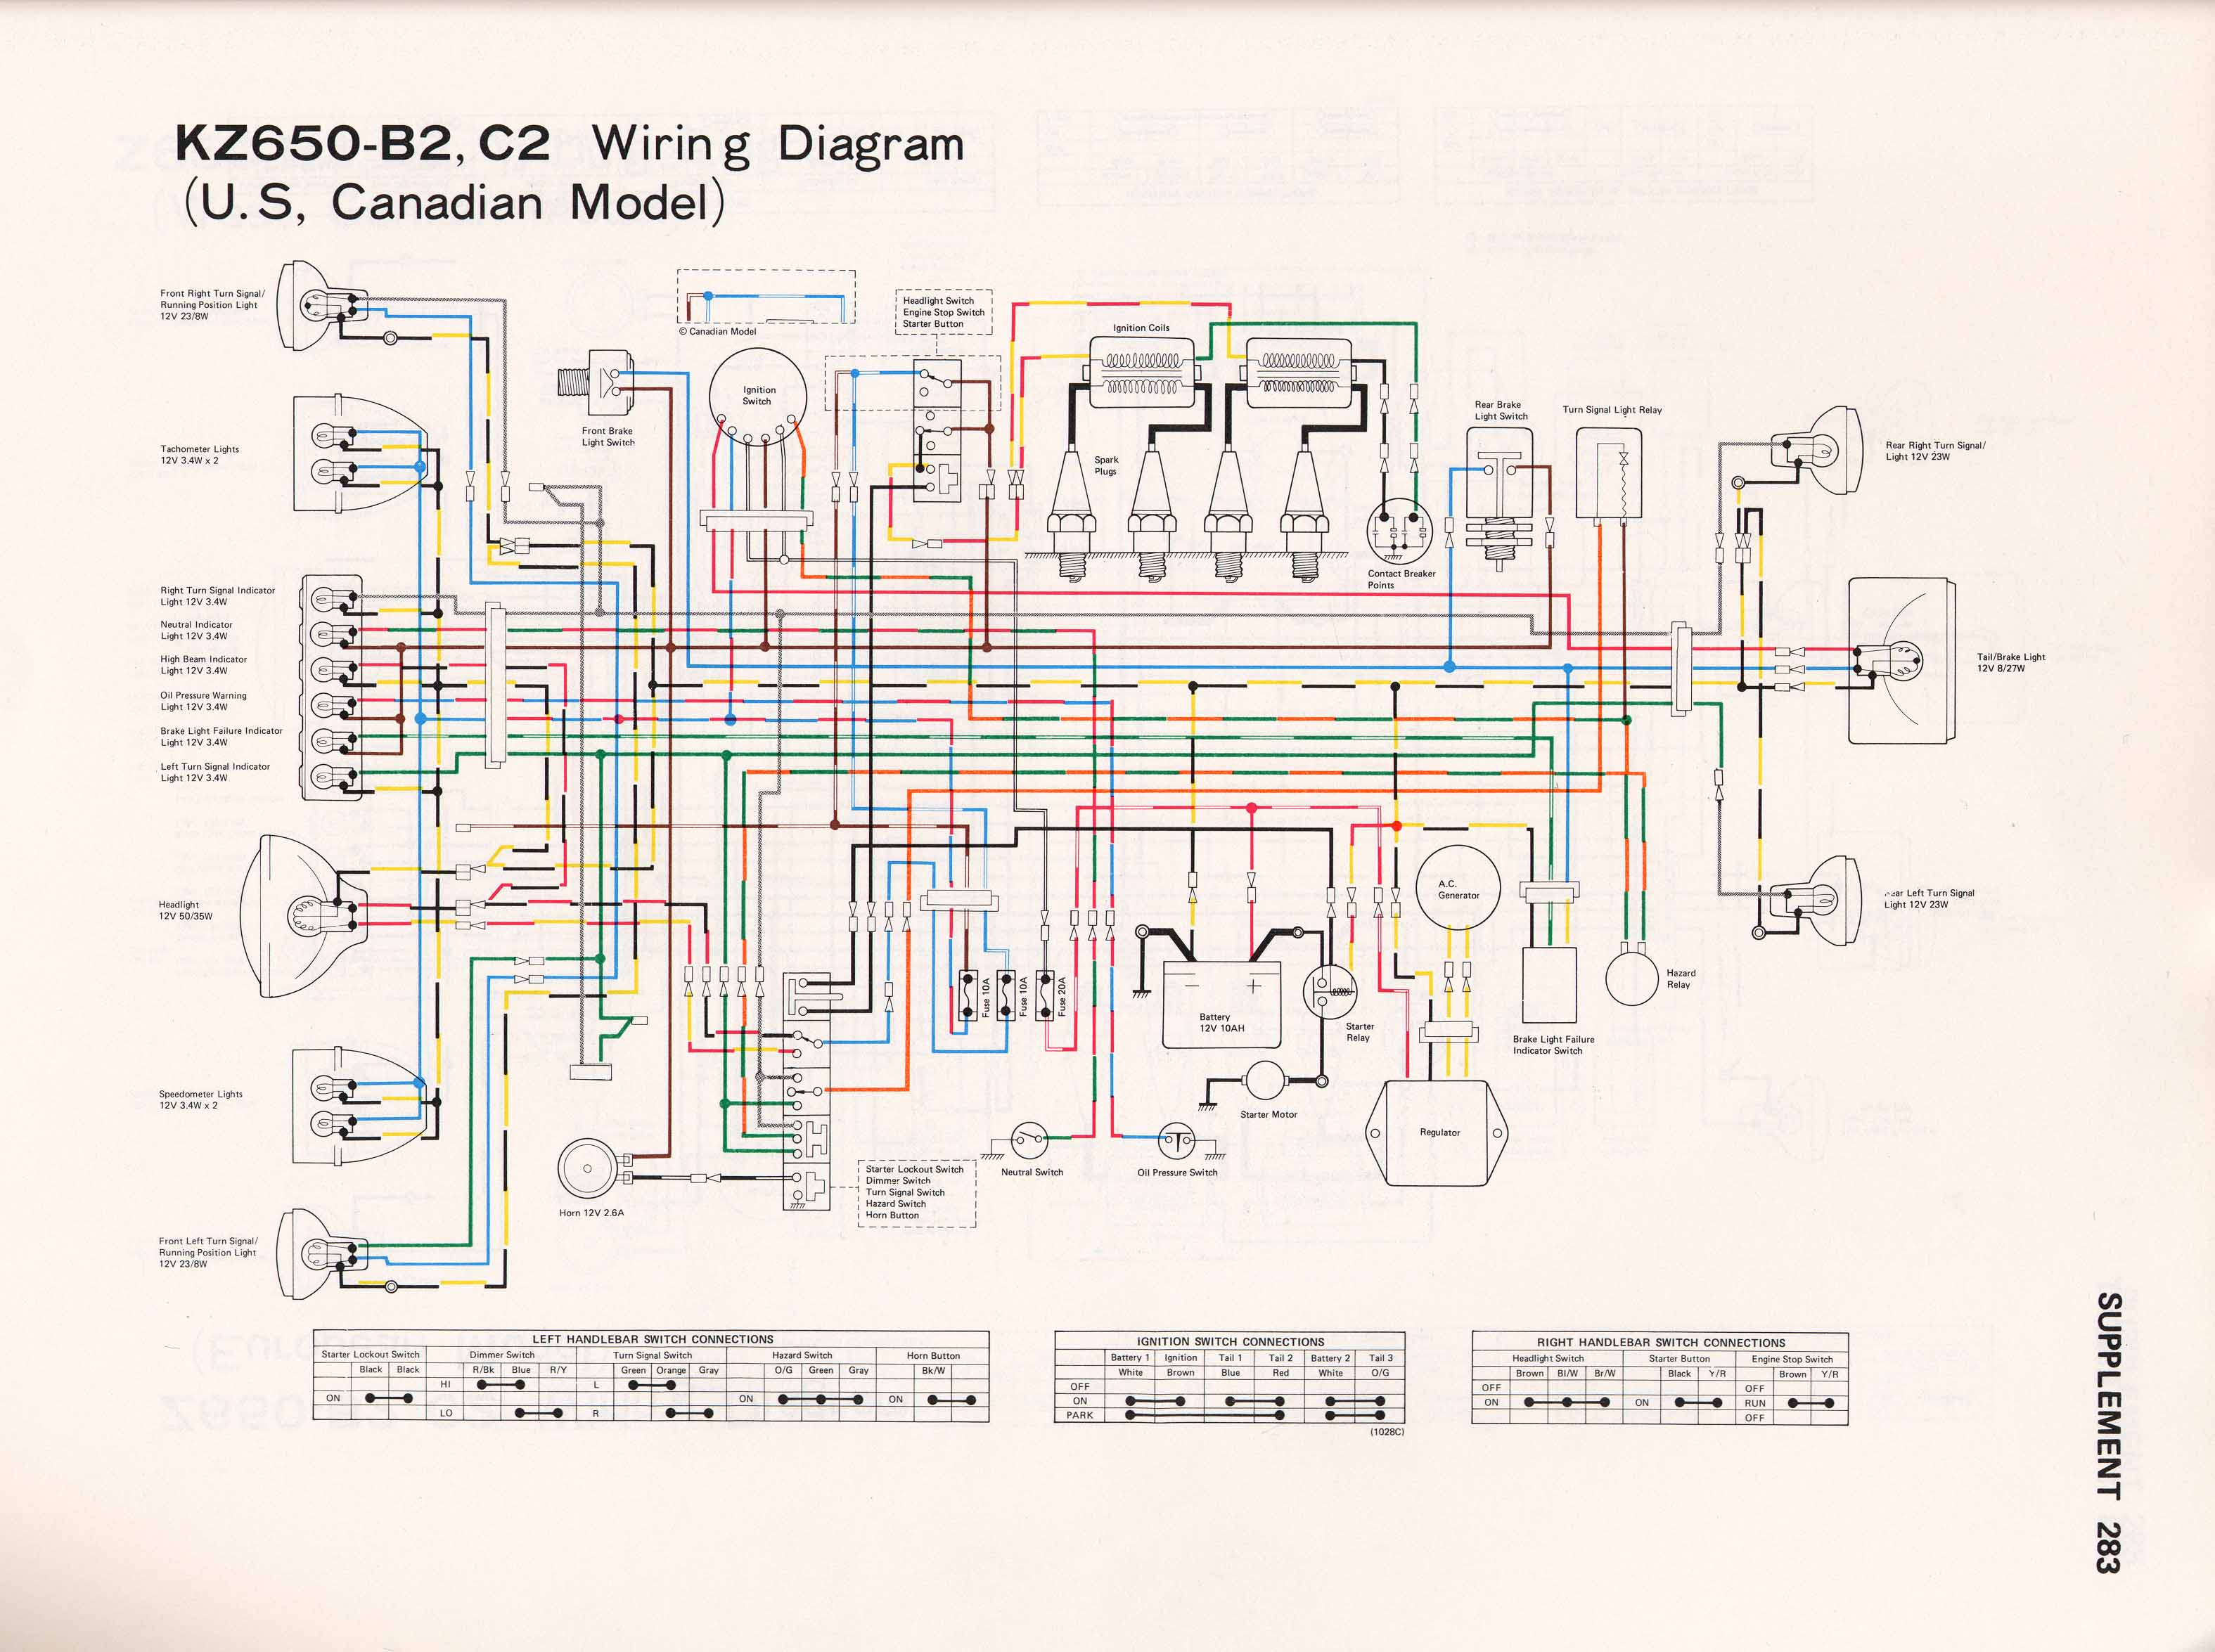 KZ650 INFO - Wiring Diagrams